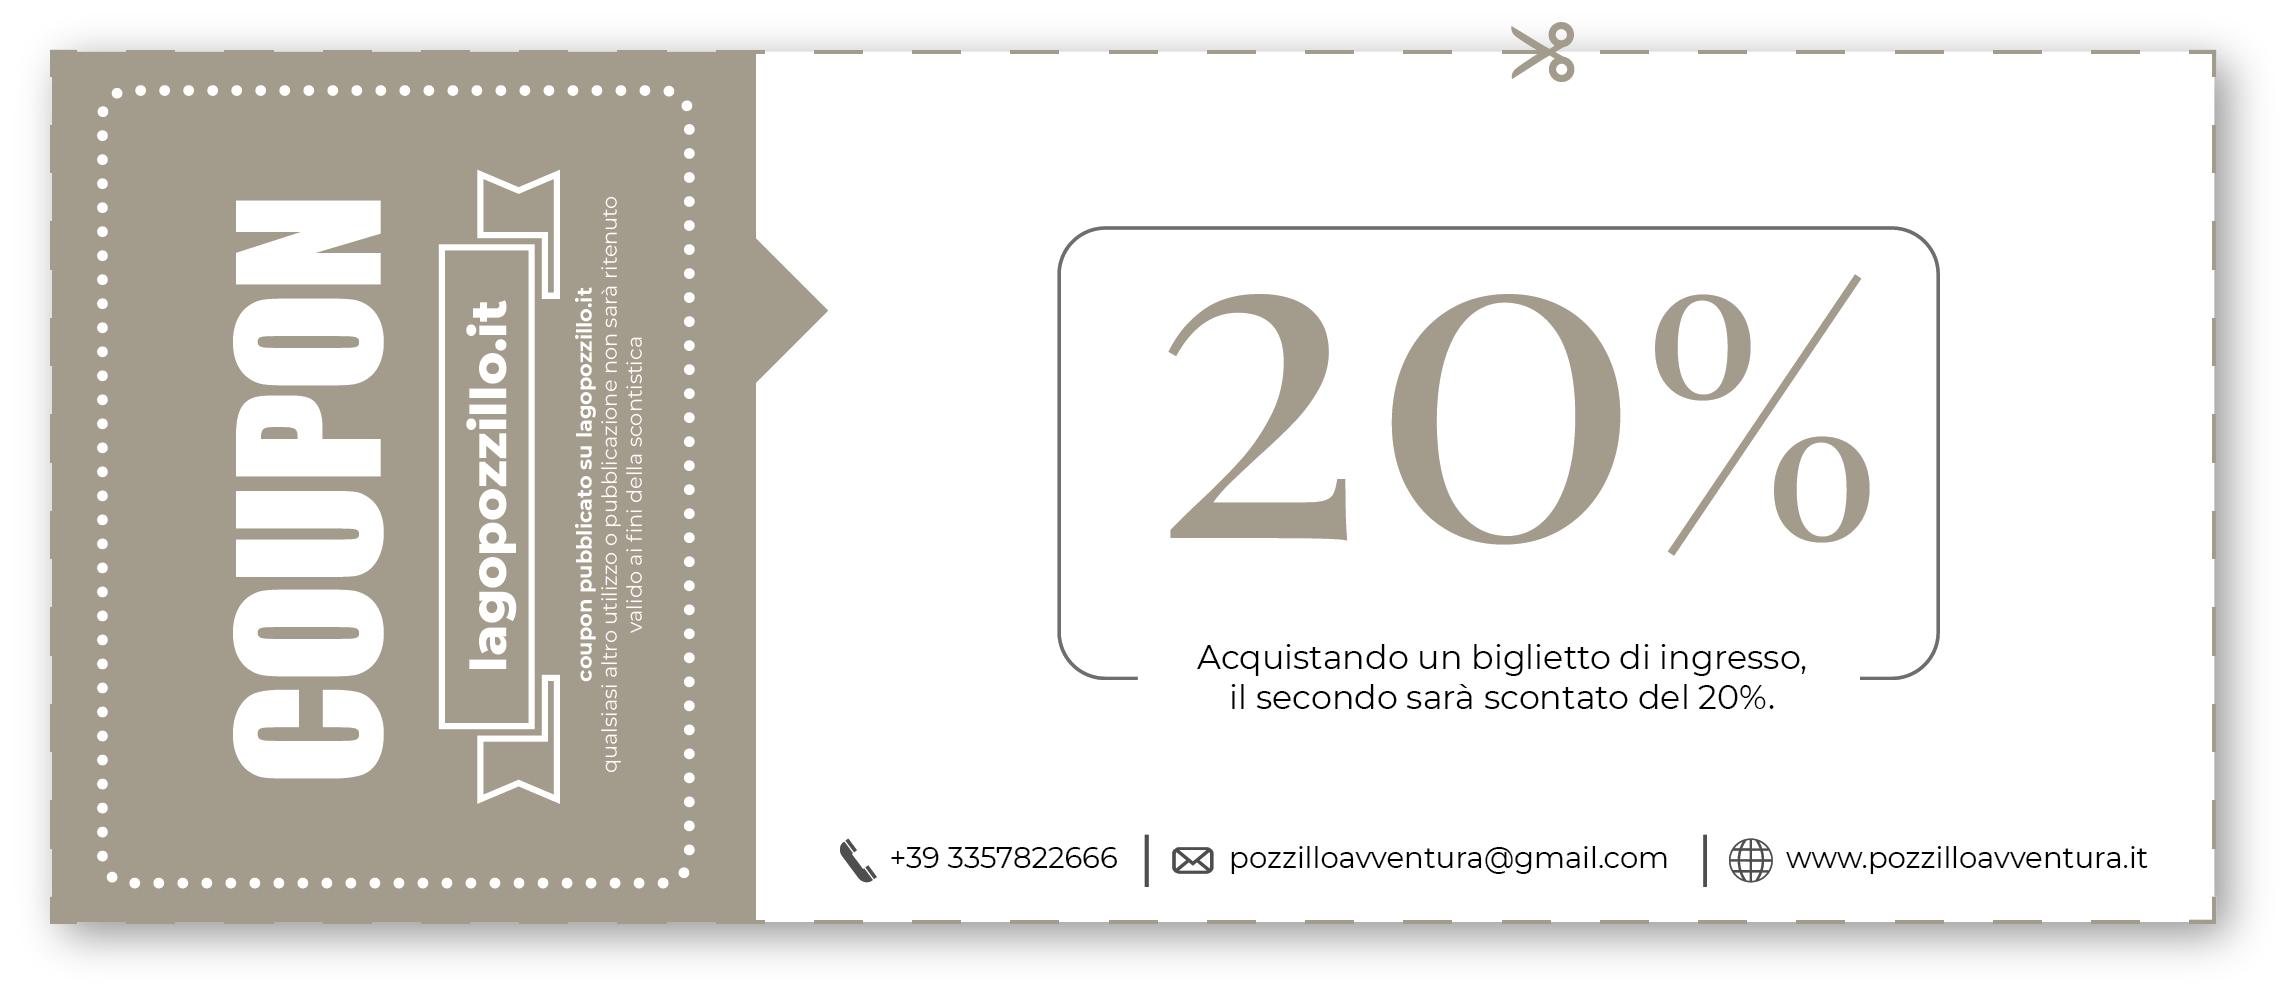 coupon-pozzilloavventura